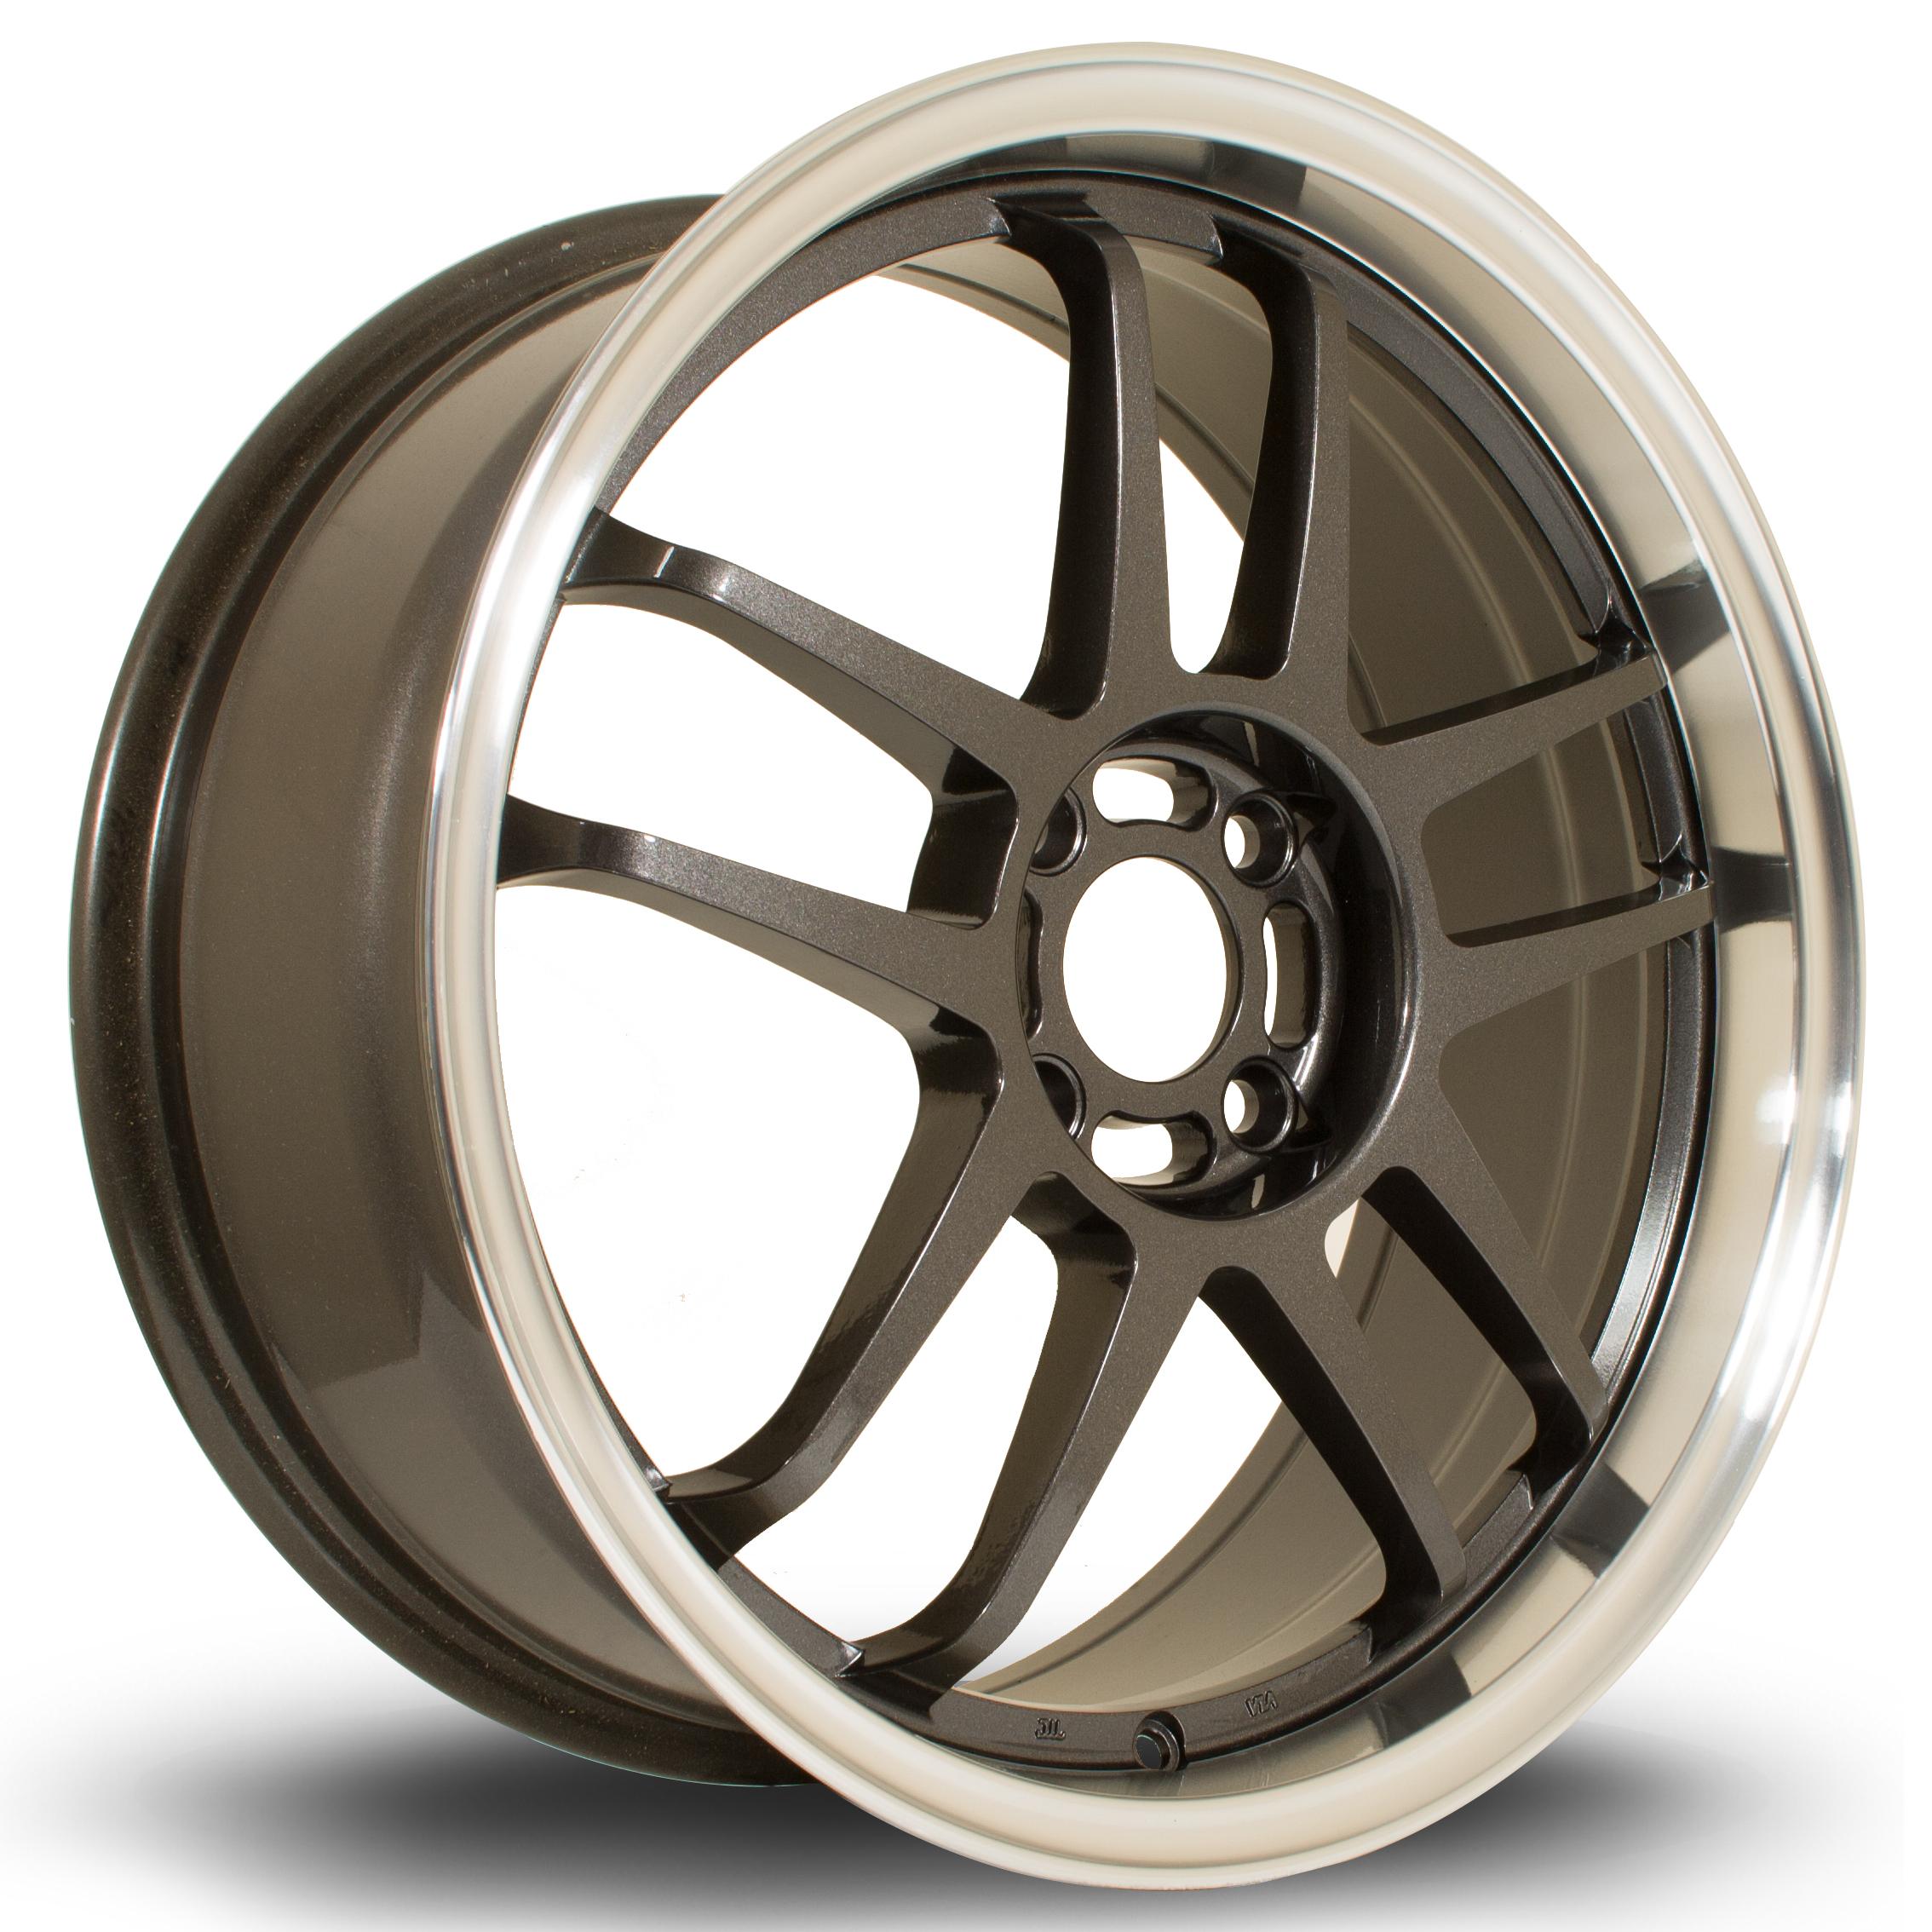 ROTA Sub hliníkové disky 7,5x18 4x108 ET45 RLGunmetal